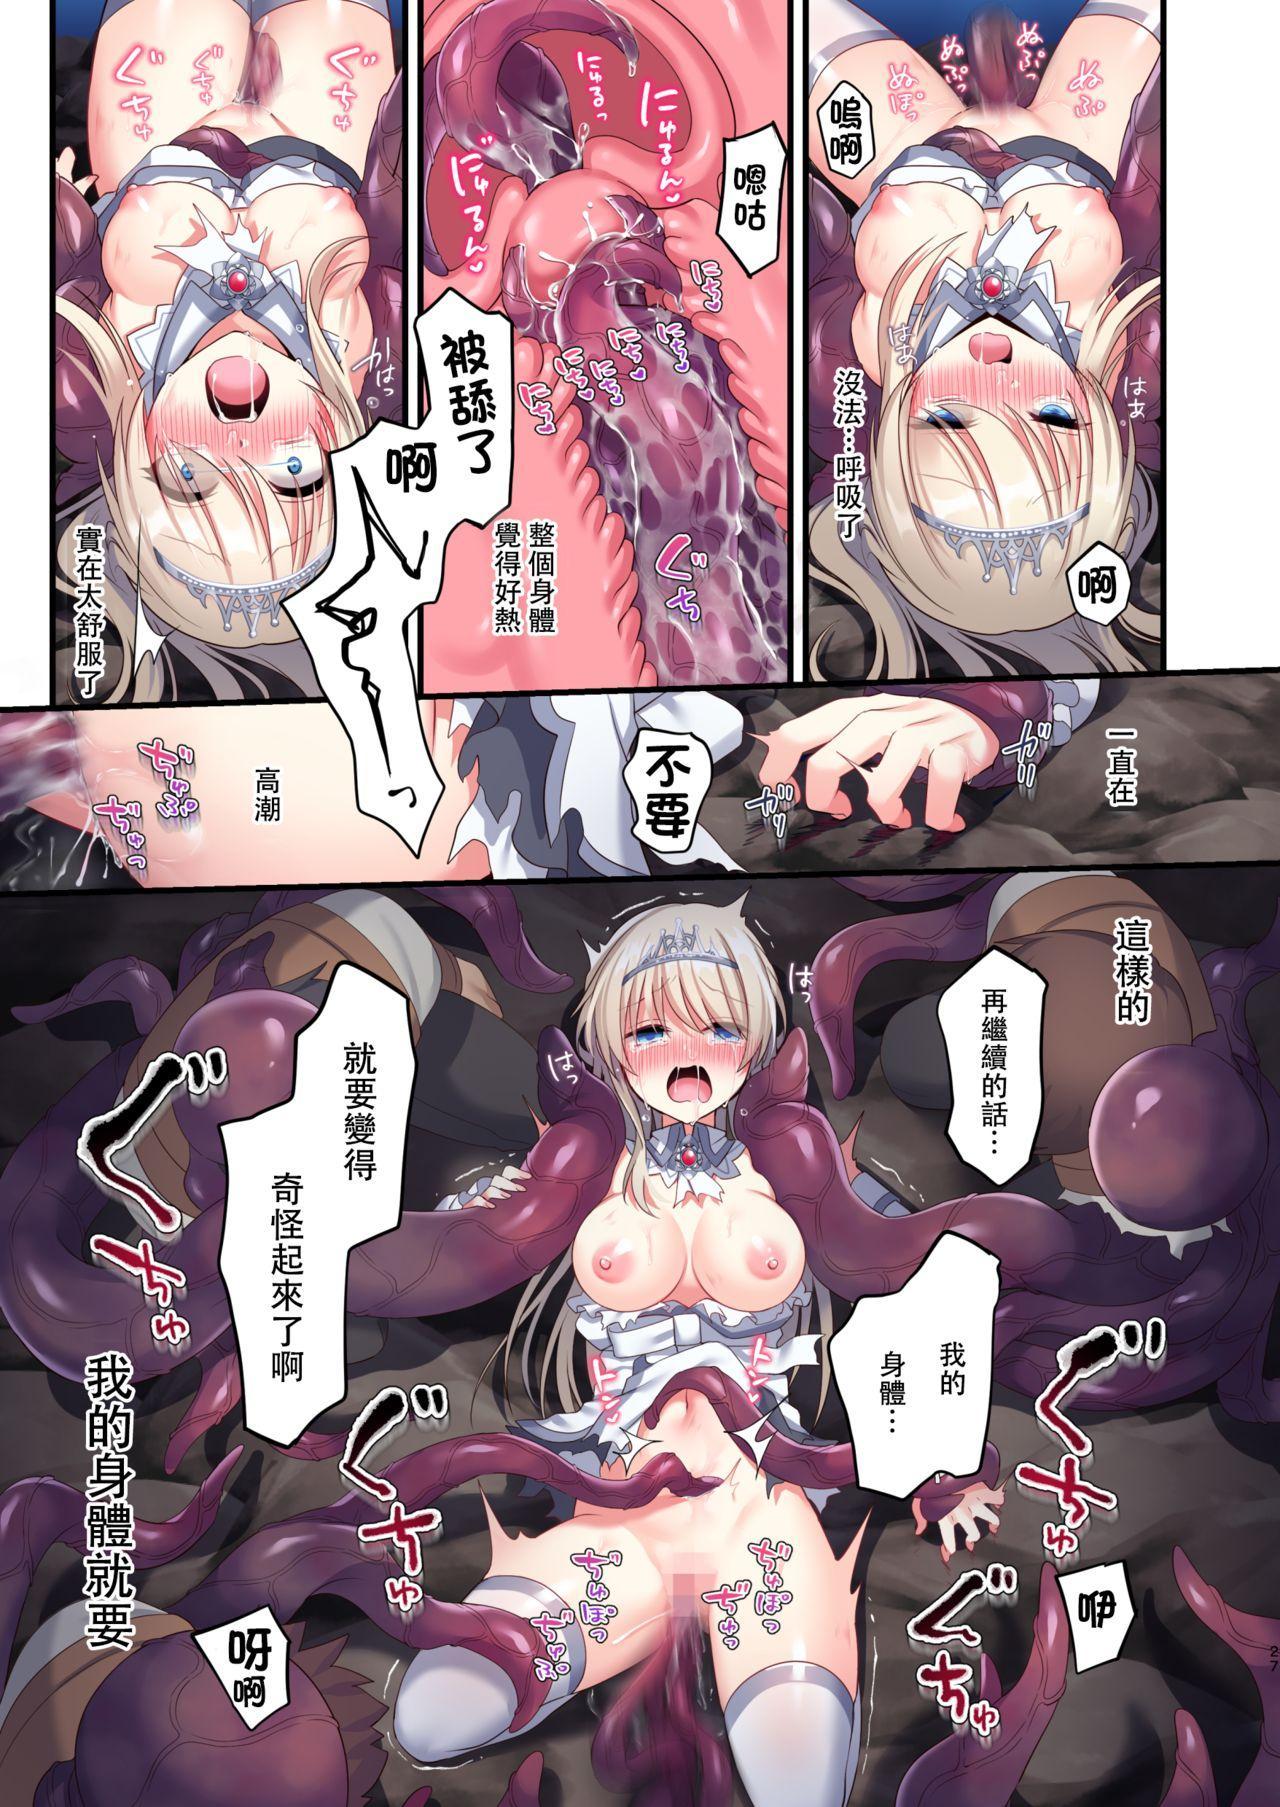 Noroi no Yubiwa de Game Over + Omake CG 27